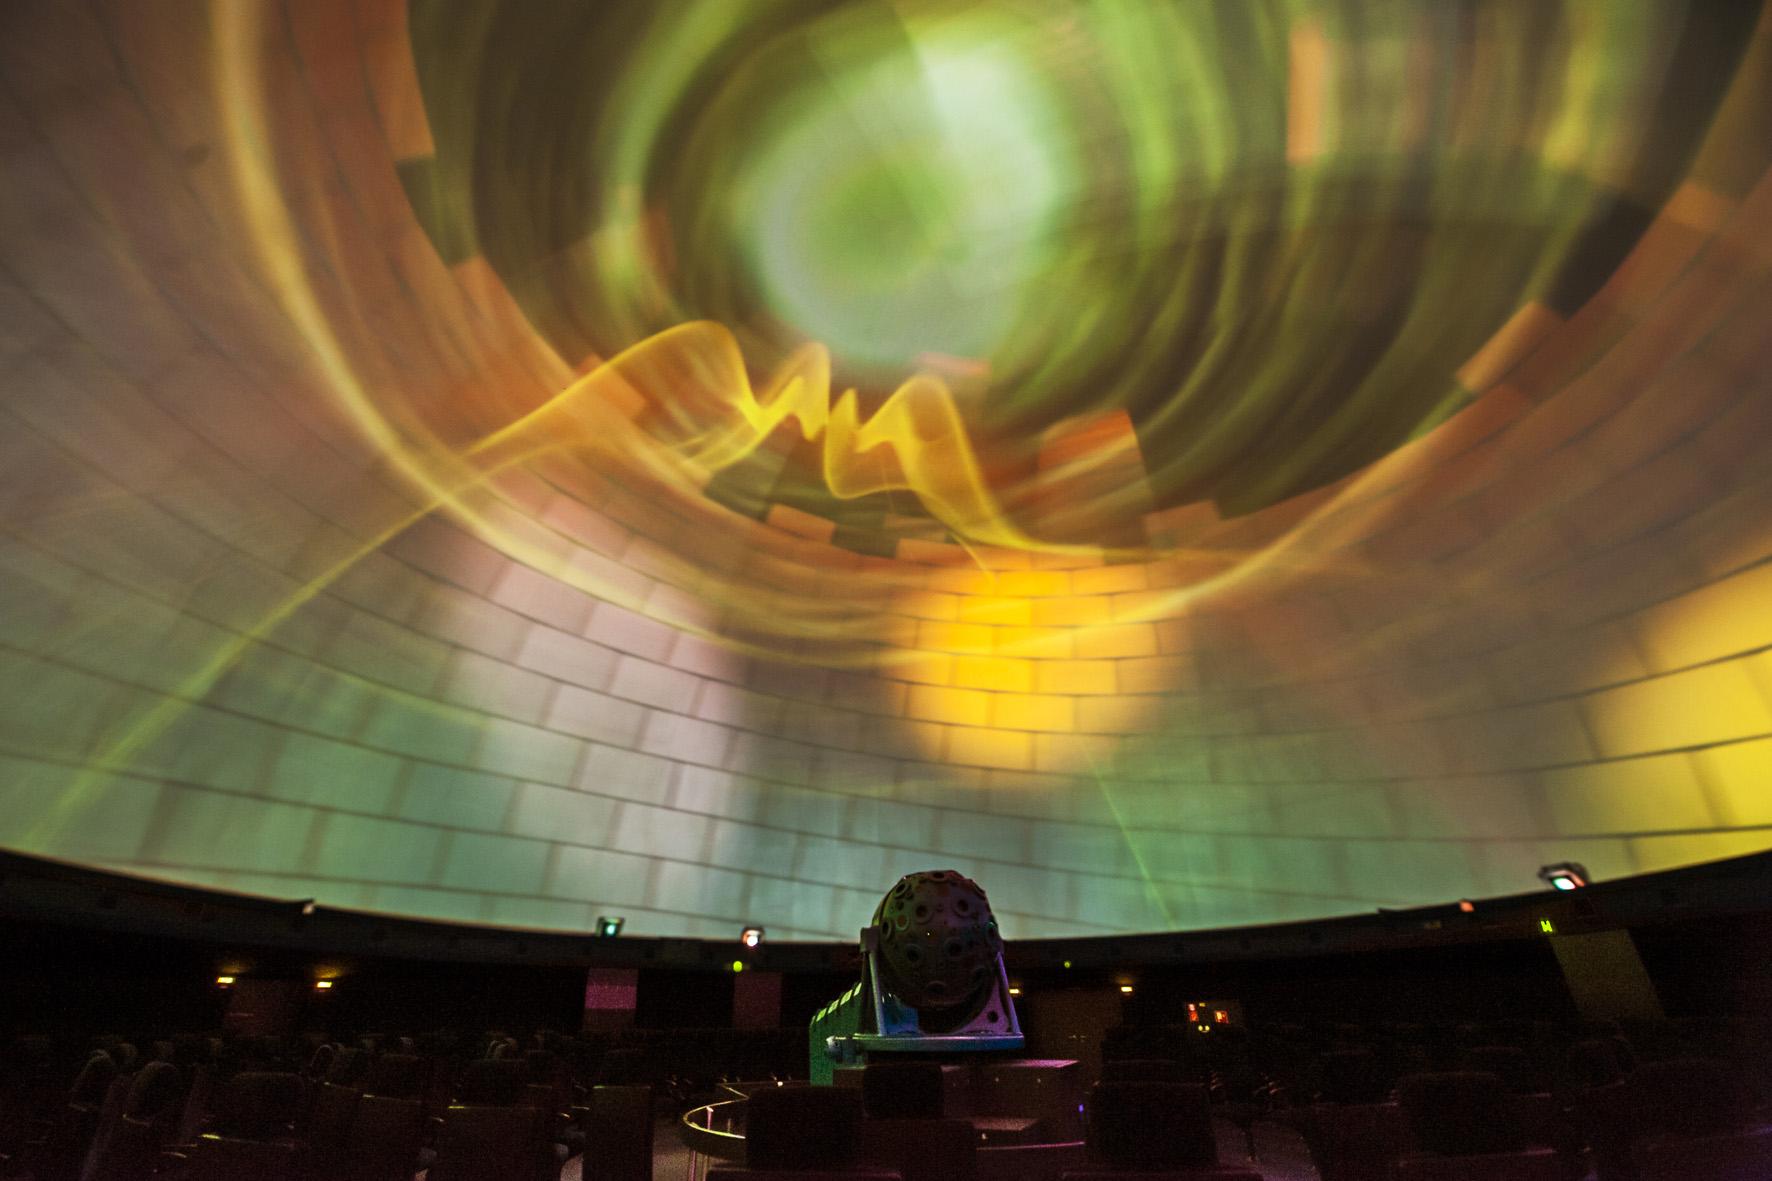 Bilddatei: Pink_Floyd_TheWall_02-kl(C)Oblonczyk,LWL.jpg